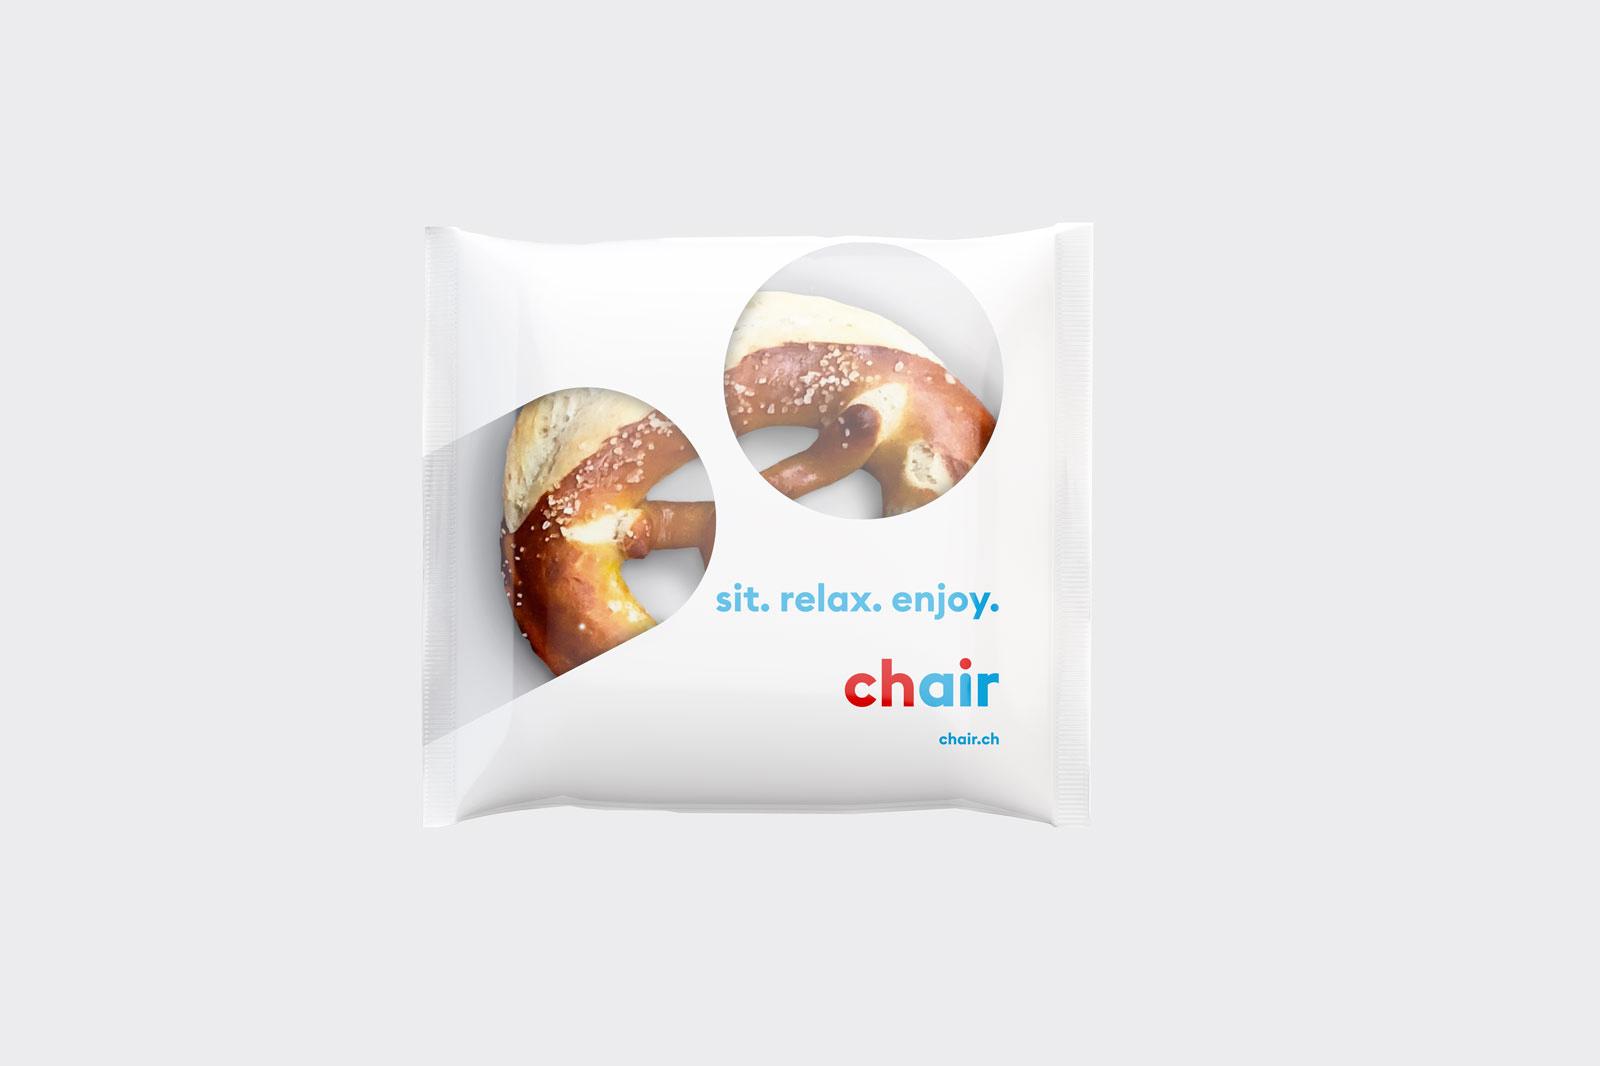 Germania更名Chair航空品牌更新全新的品牌VI形象设计-深圳VI设计5